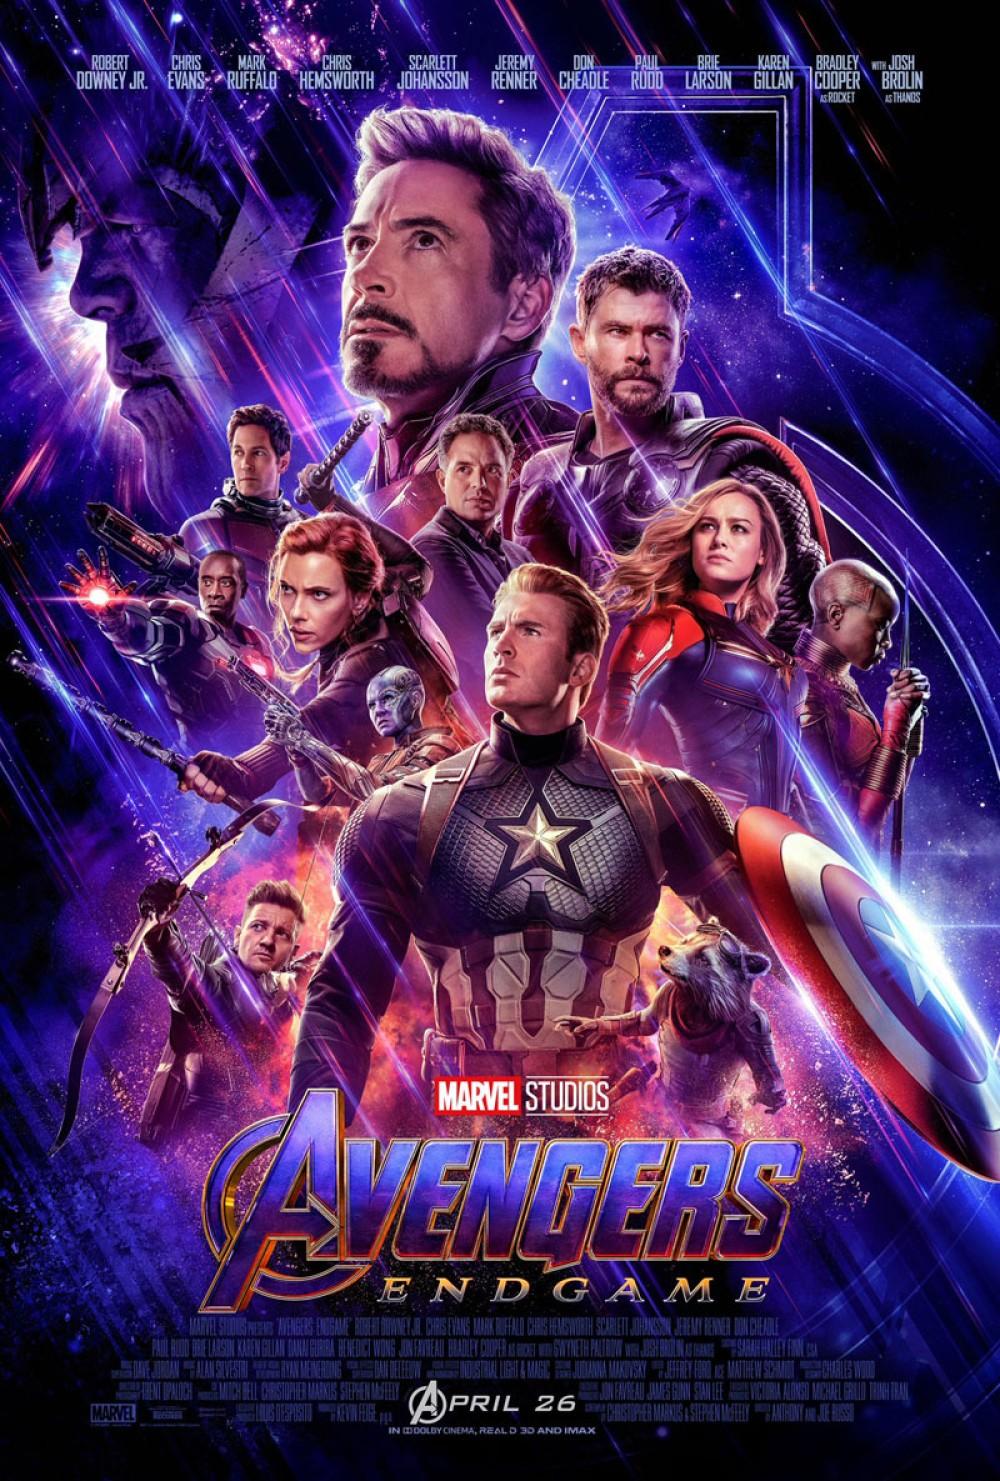 Avengers: Endgame, το νέο teaser trailer ίσως επιβεβαιώνει αυτό που περιμένουμε όλοι